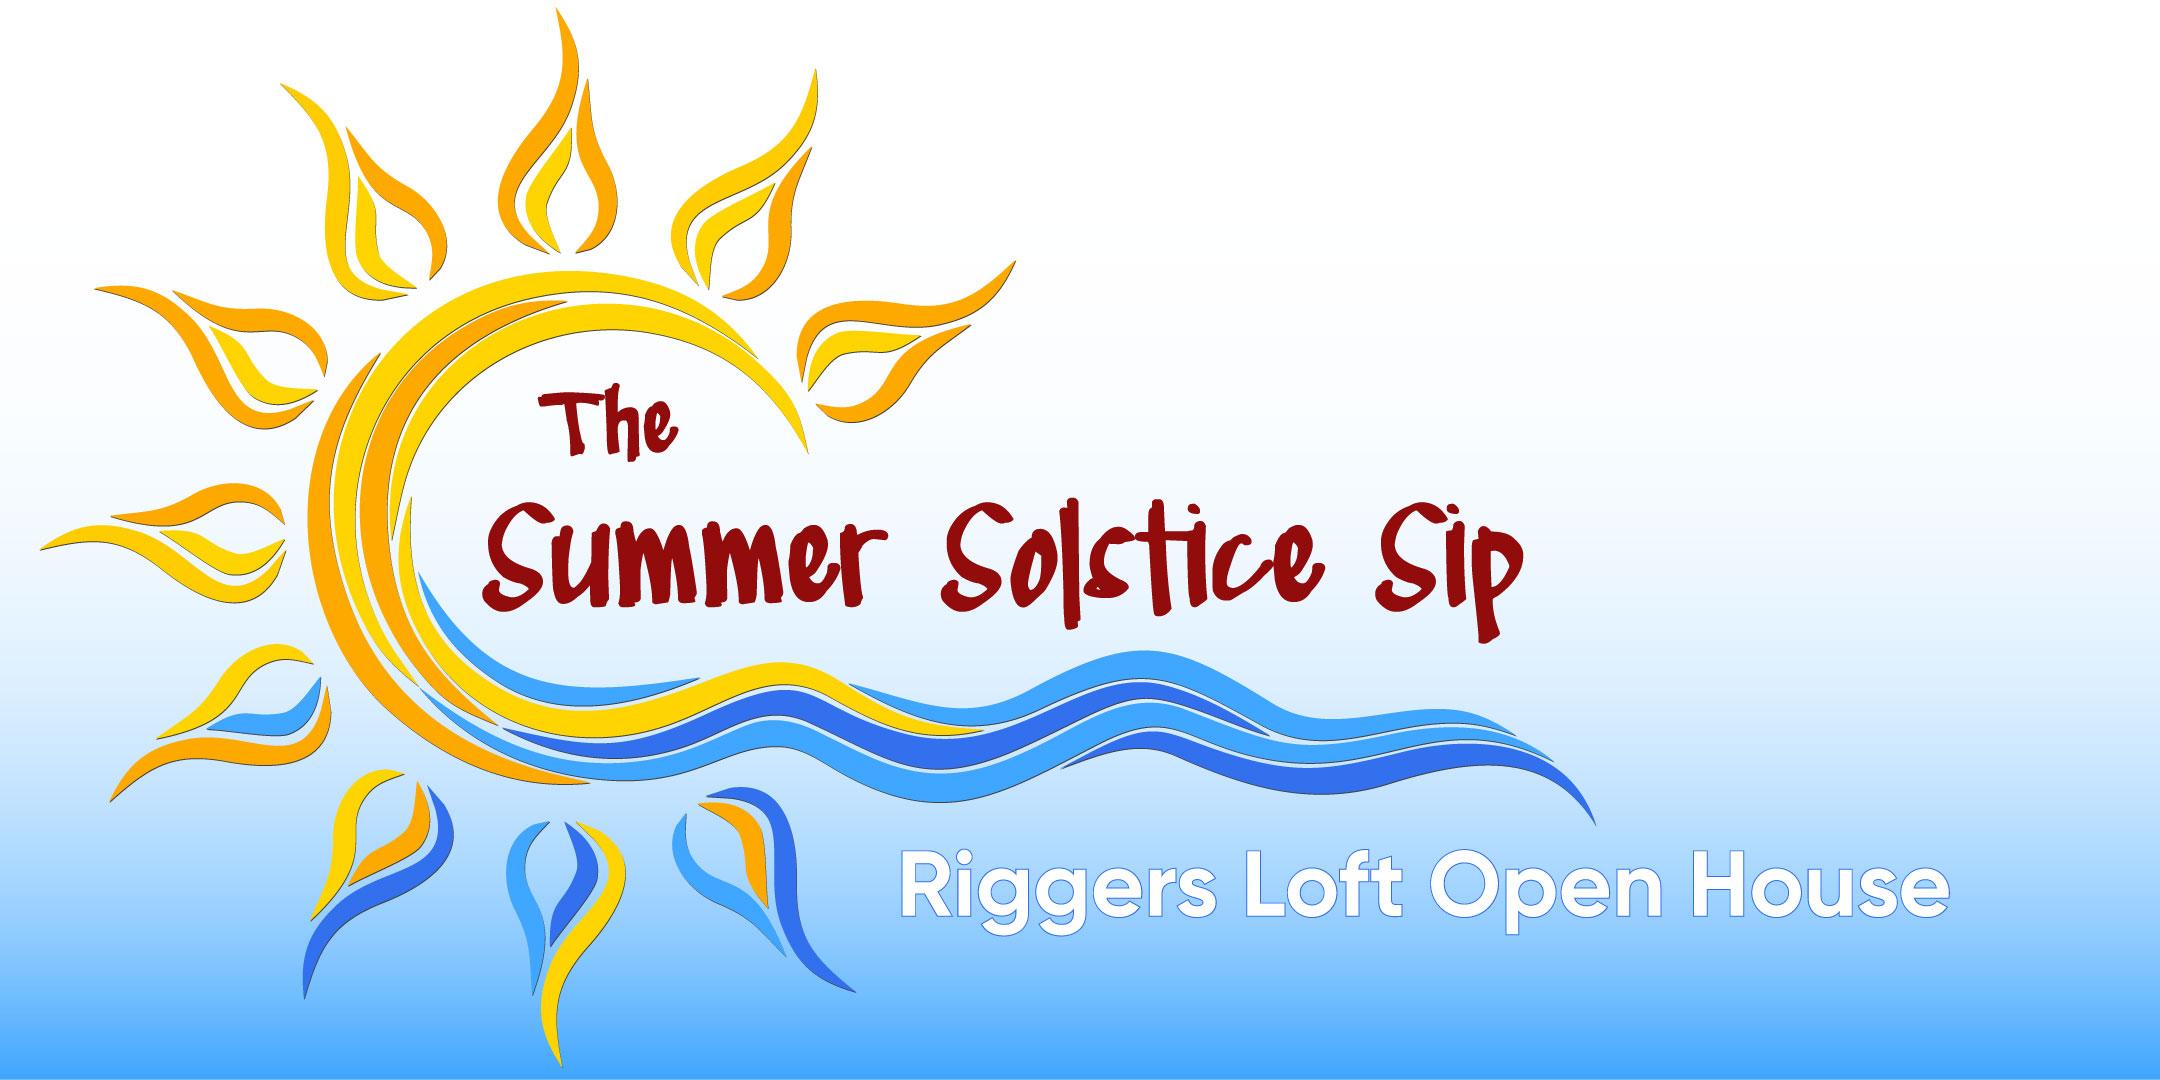 SummerSolsticeSip.jpg